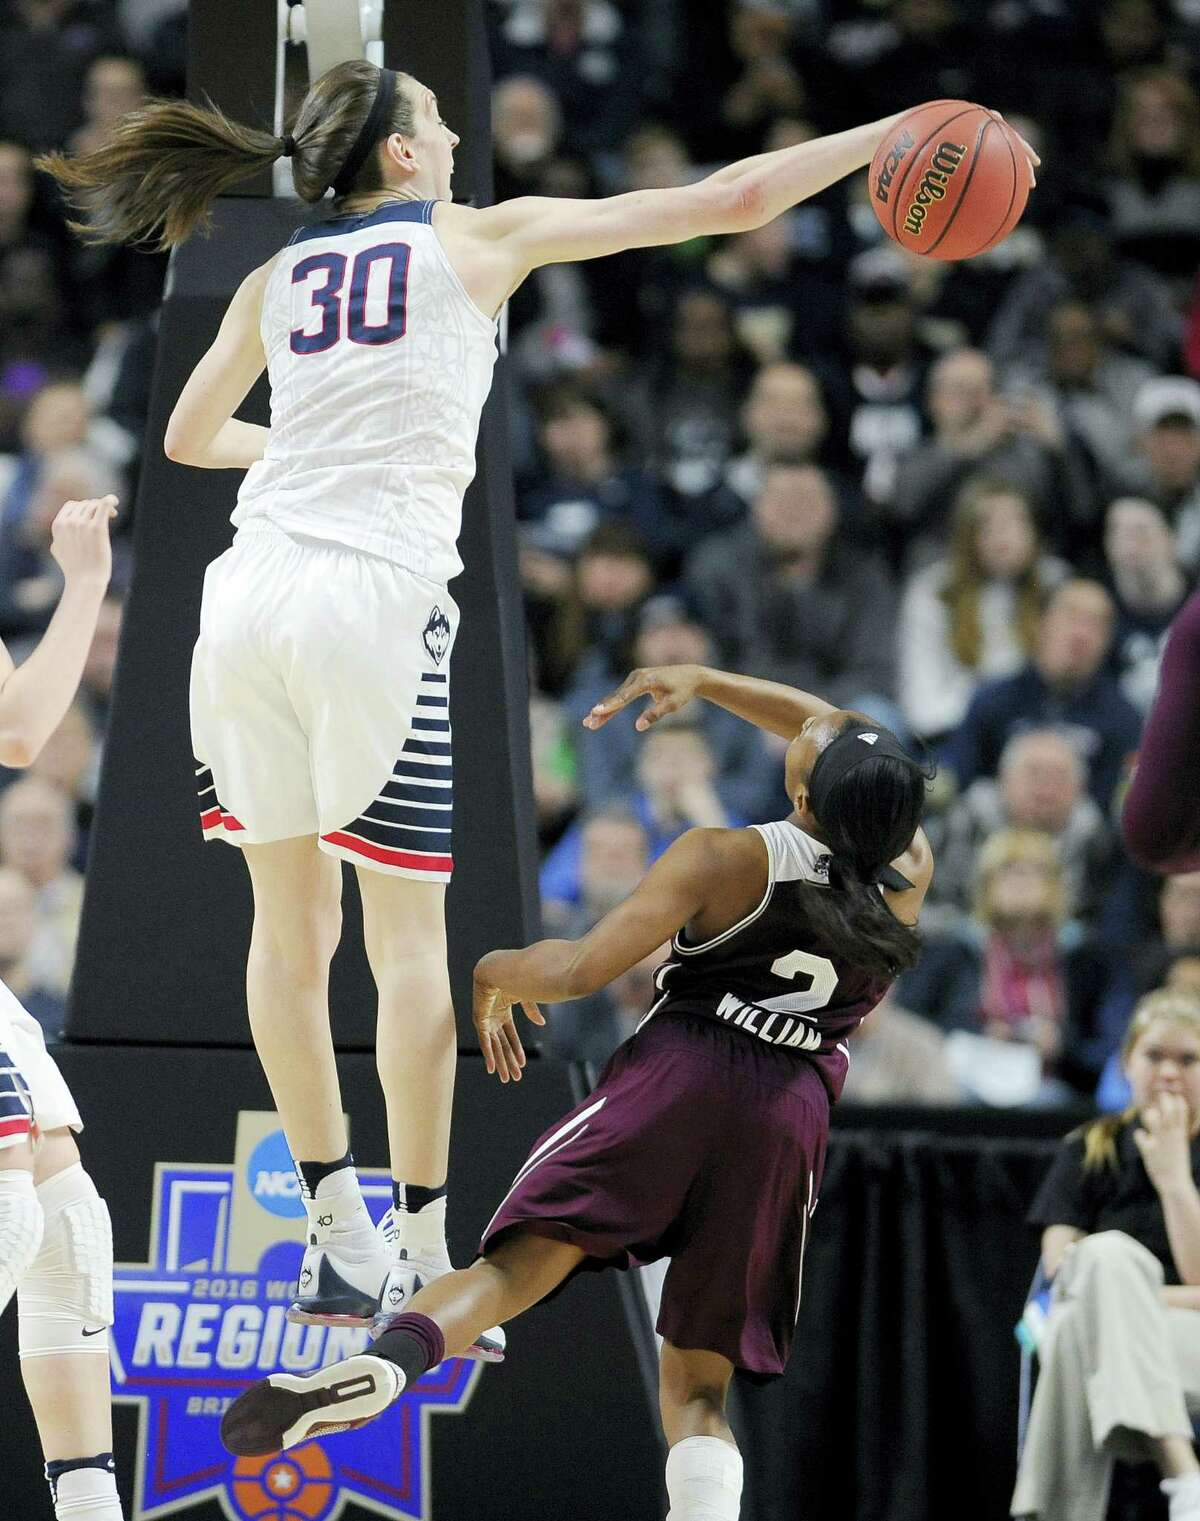 UConn's Breanna Stewart, left, blocks a shot by Mississippi State's Morgan William during the regional semifinals in Bridgeport.